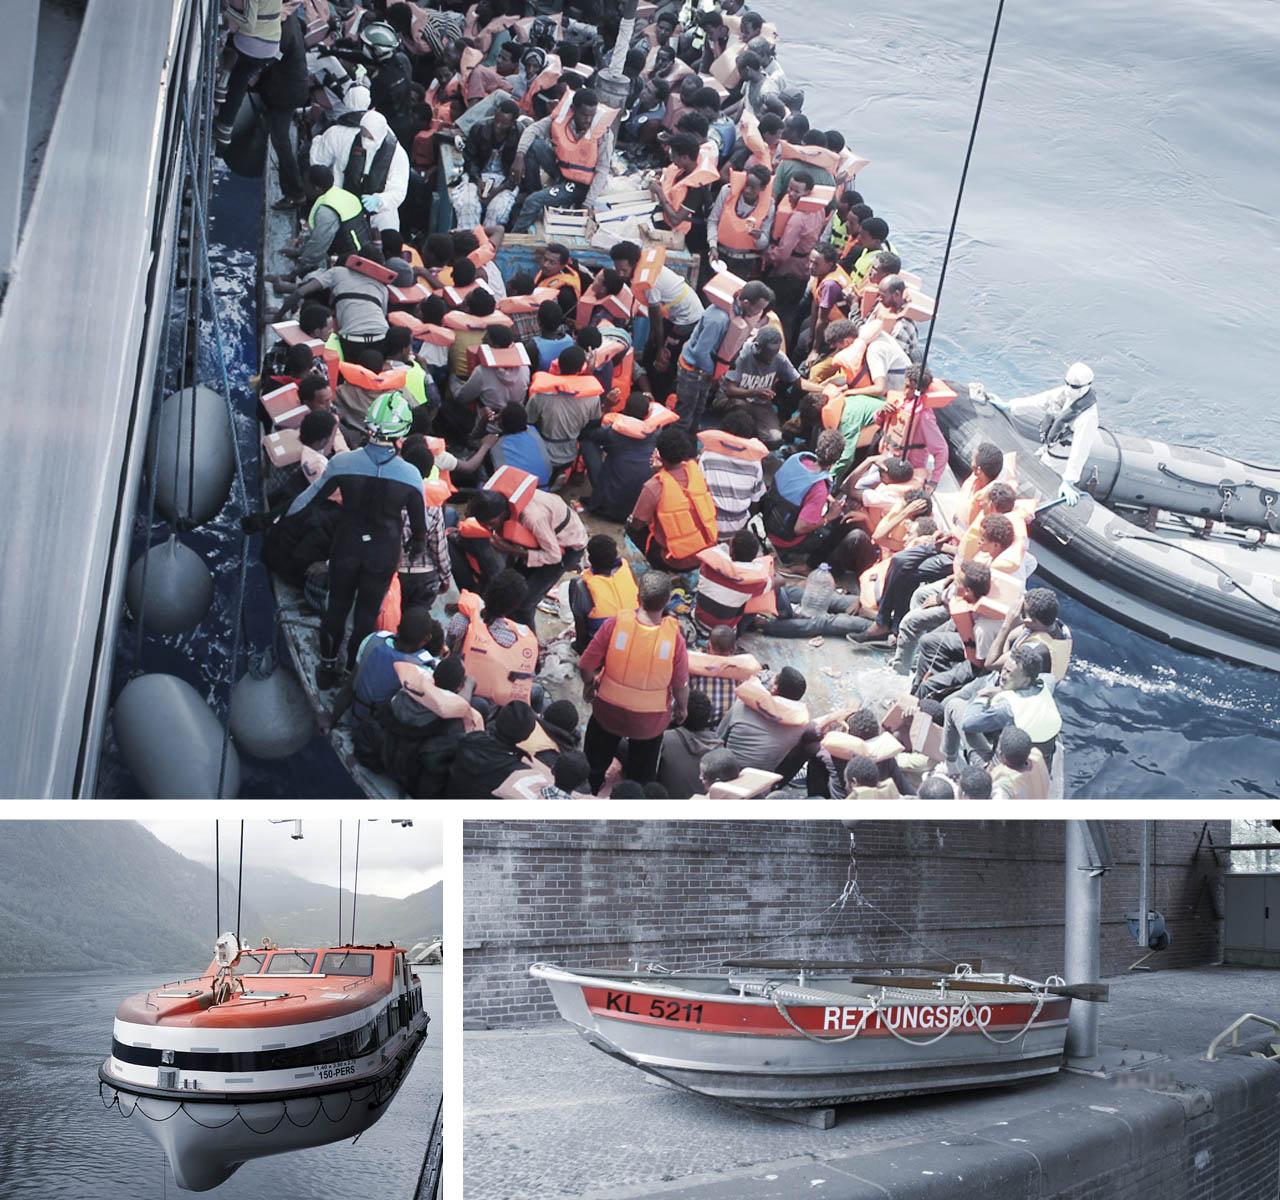 Florian-Mack-Industrial Design Resboat - Research